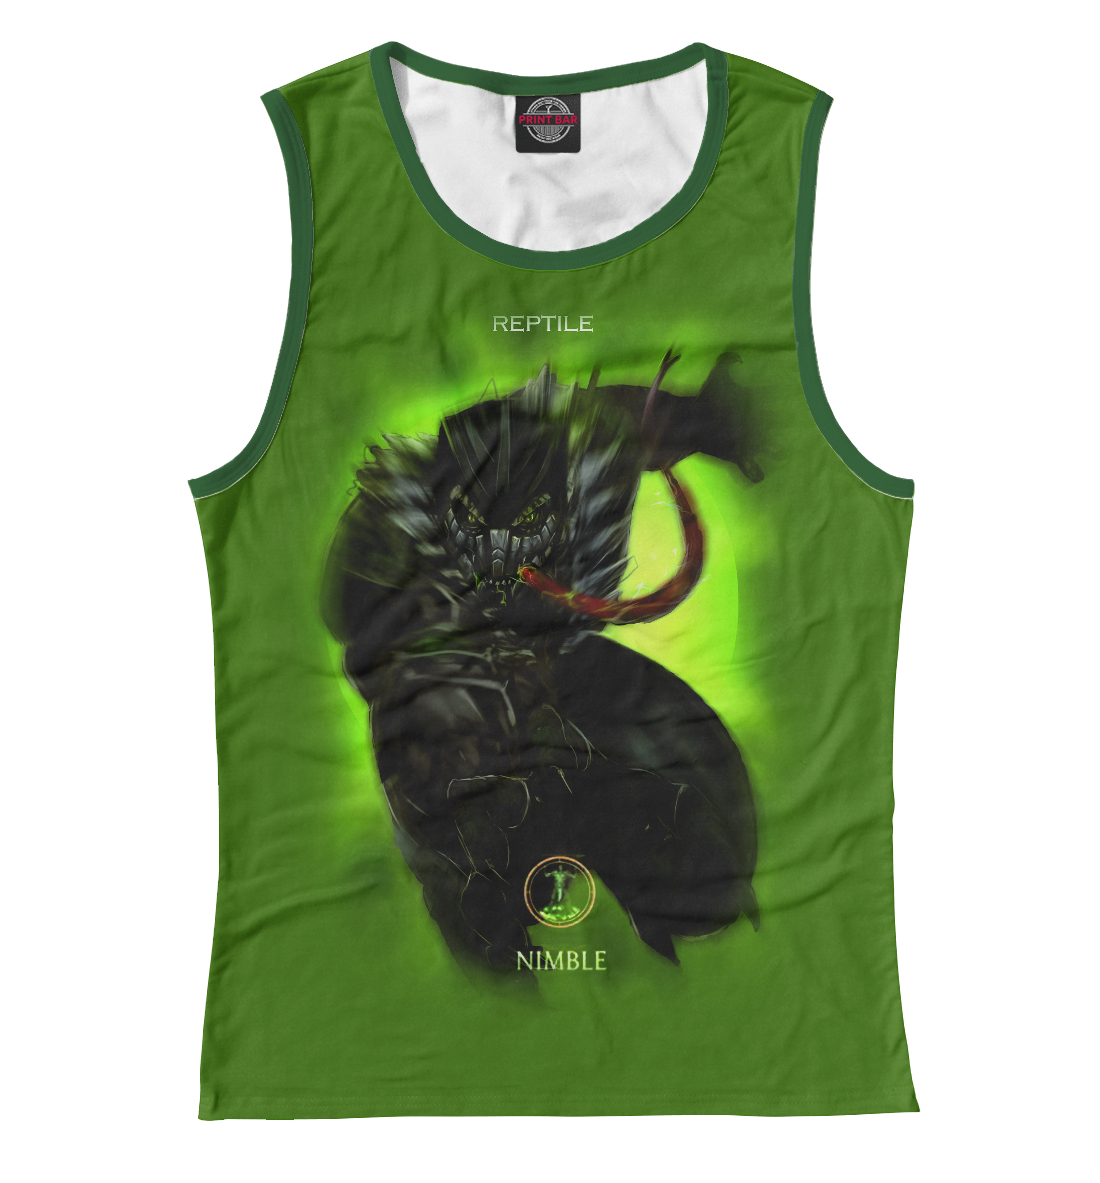 Купить Reptile, Printbar, Майки, MKB-943175-may-1